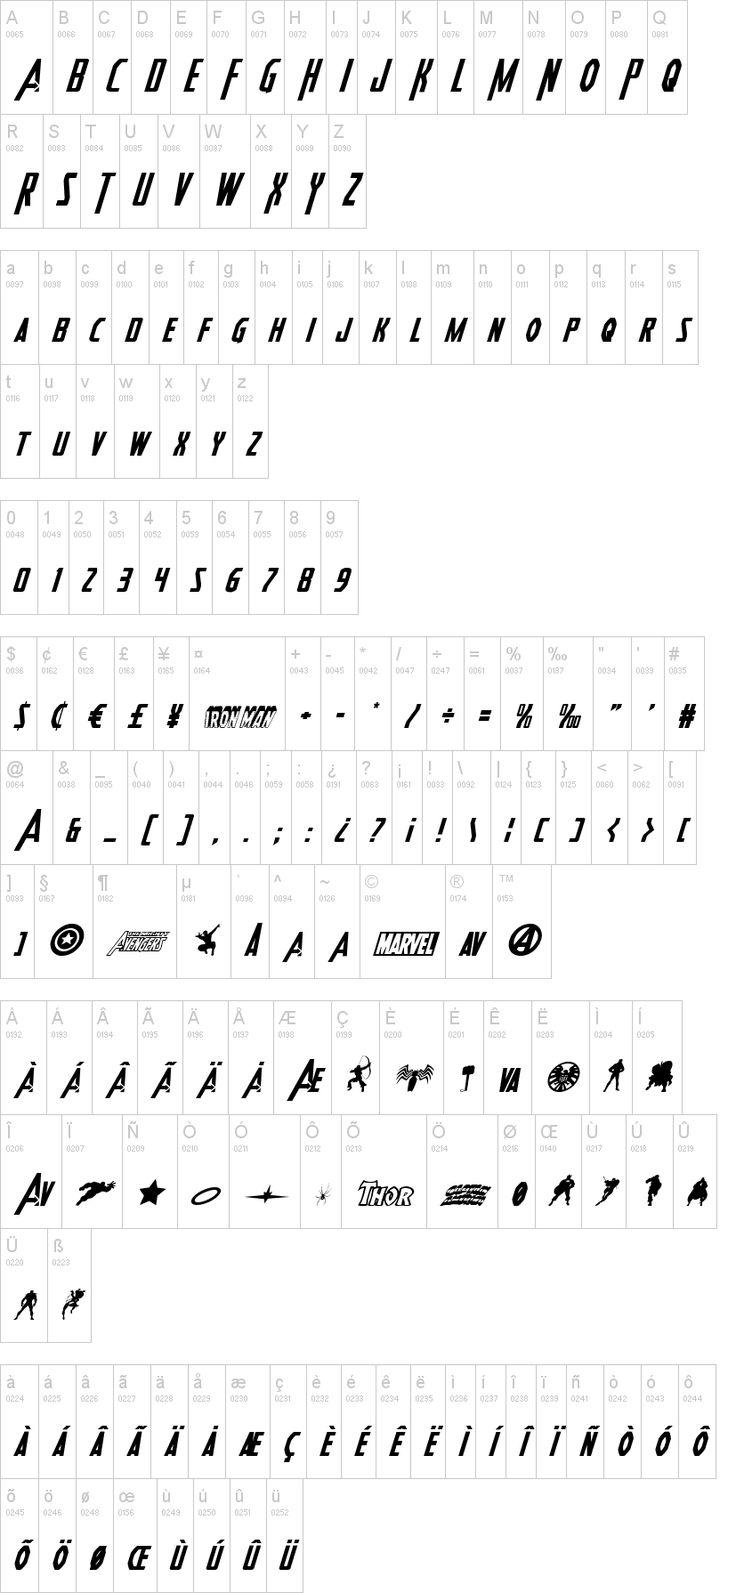 Heroes Assemble Font in 2020 Marvel font